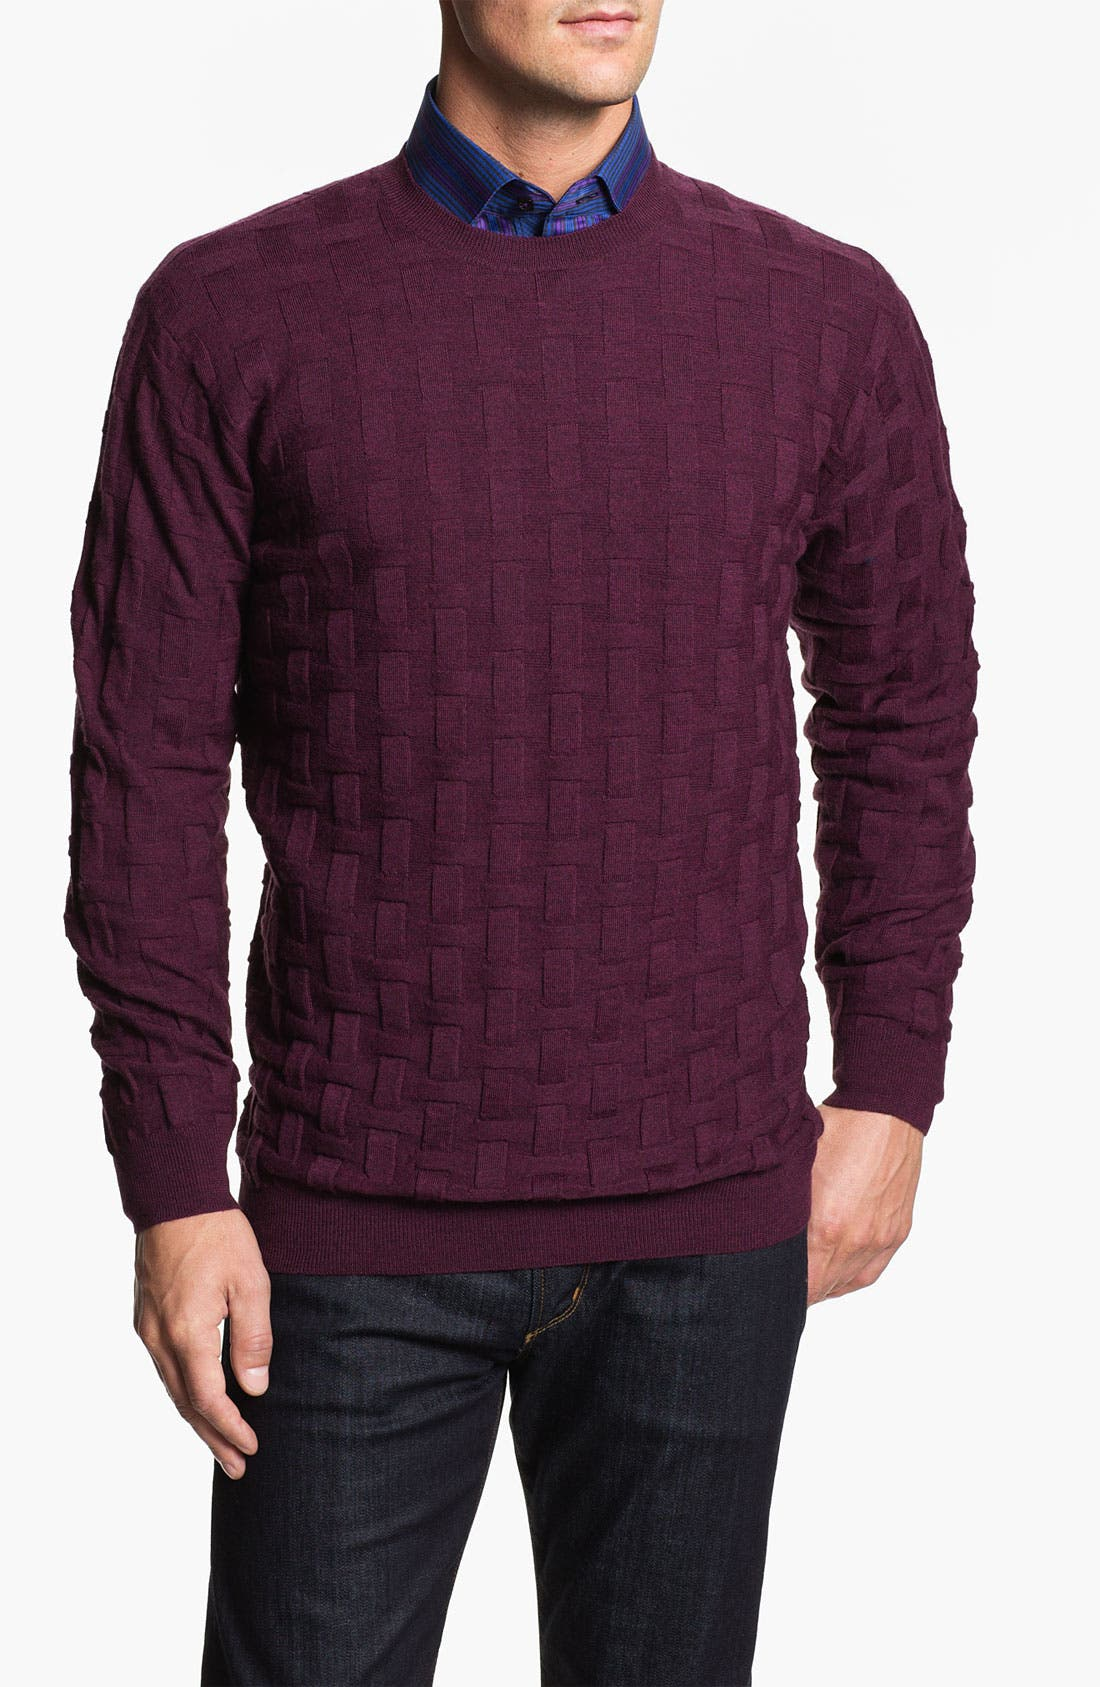 Alternate Image 1 Selected - Bugatchi Uomo Crewneck Merino Wool Sweater